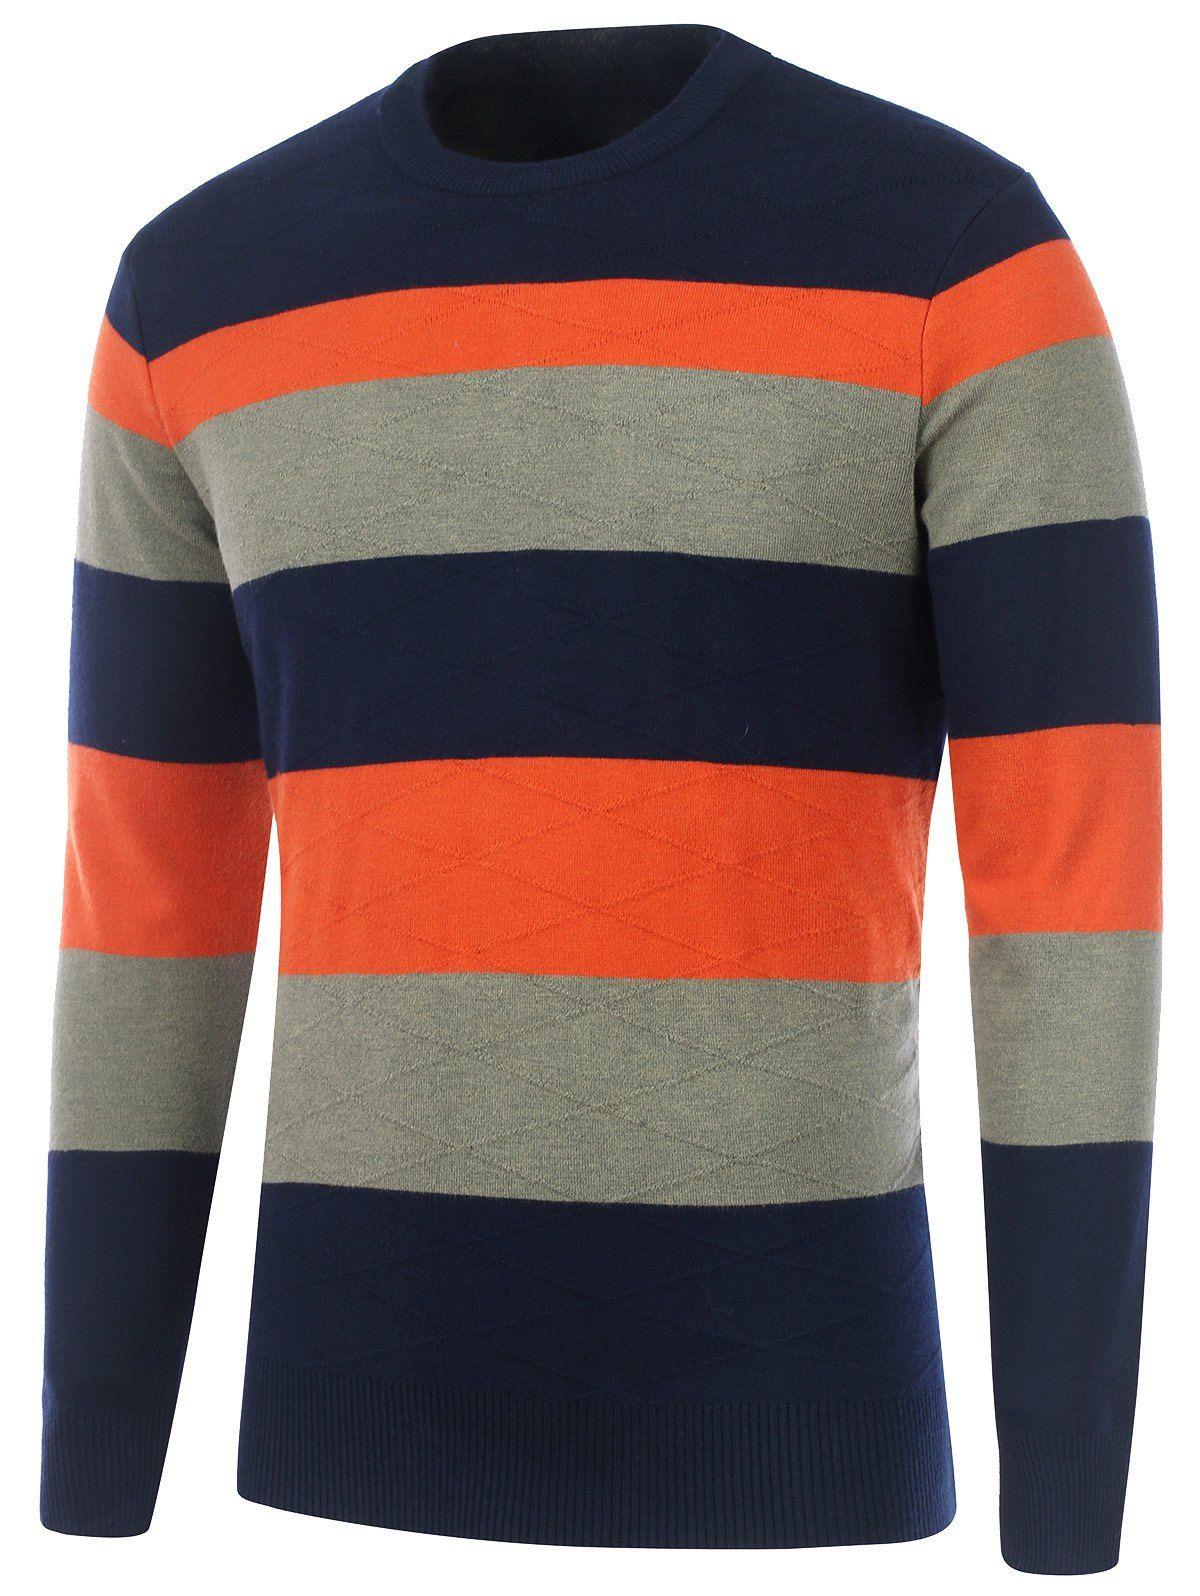 Cardigans & Sweaters | Cadetblue Striped Rhombus Pattern Crew Neck ...